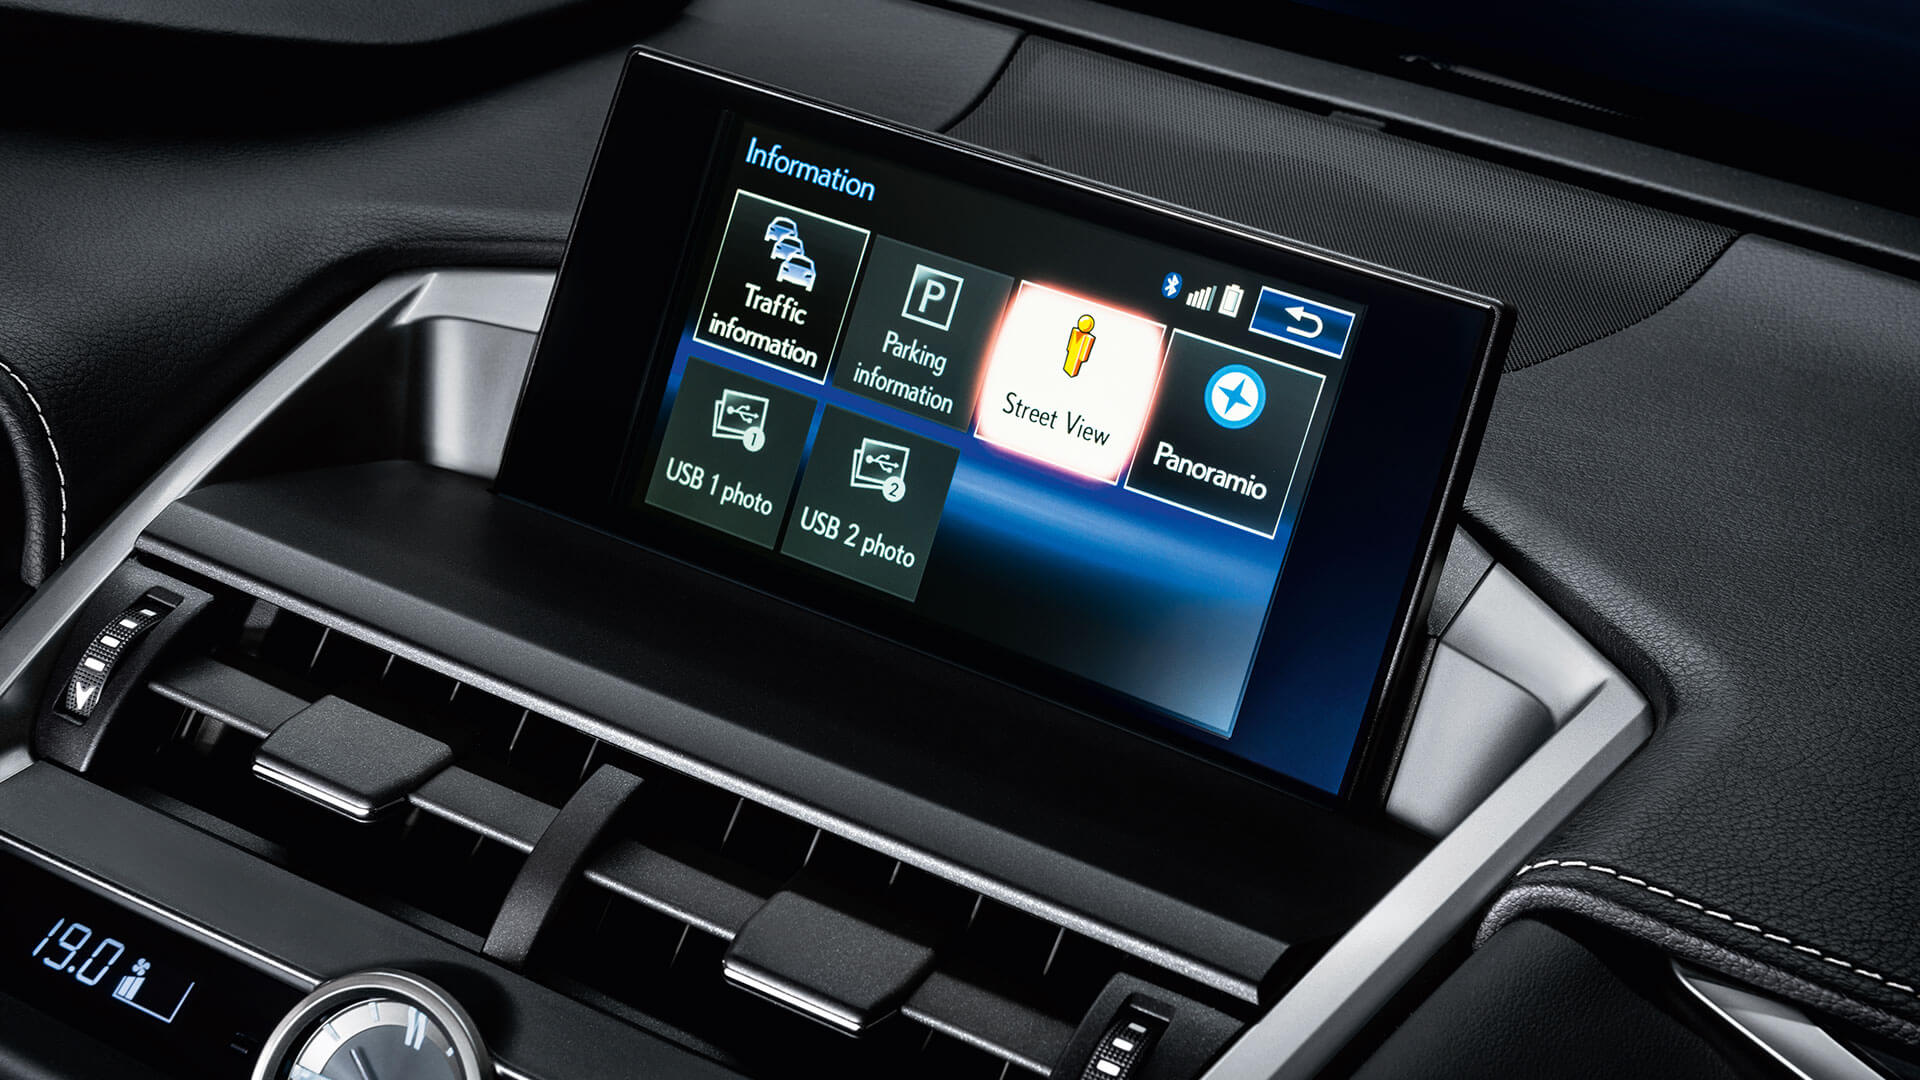 2017 lexus nx 200t features multimedia device